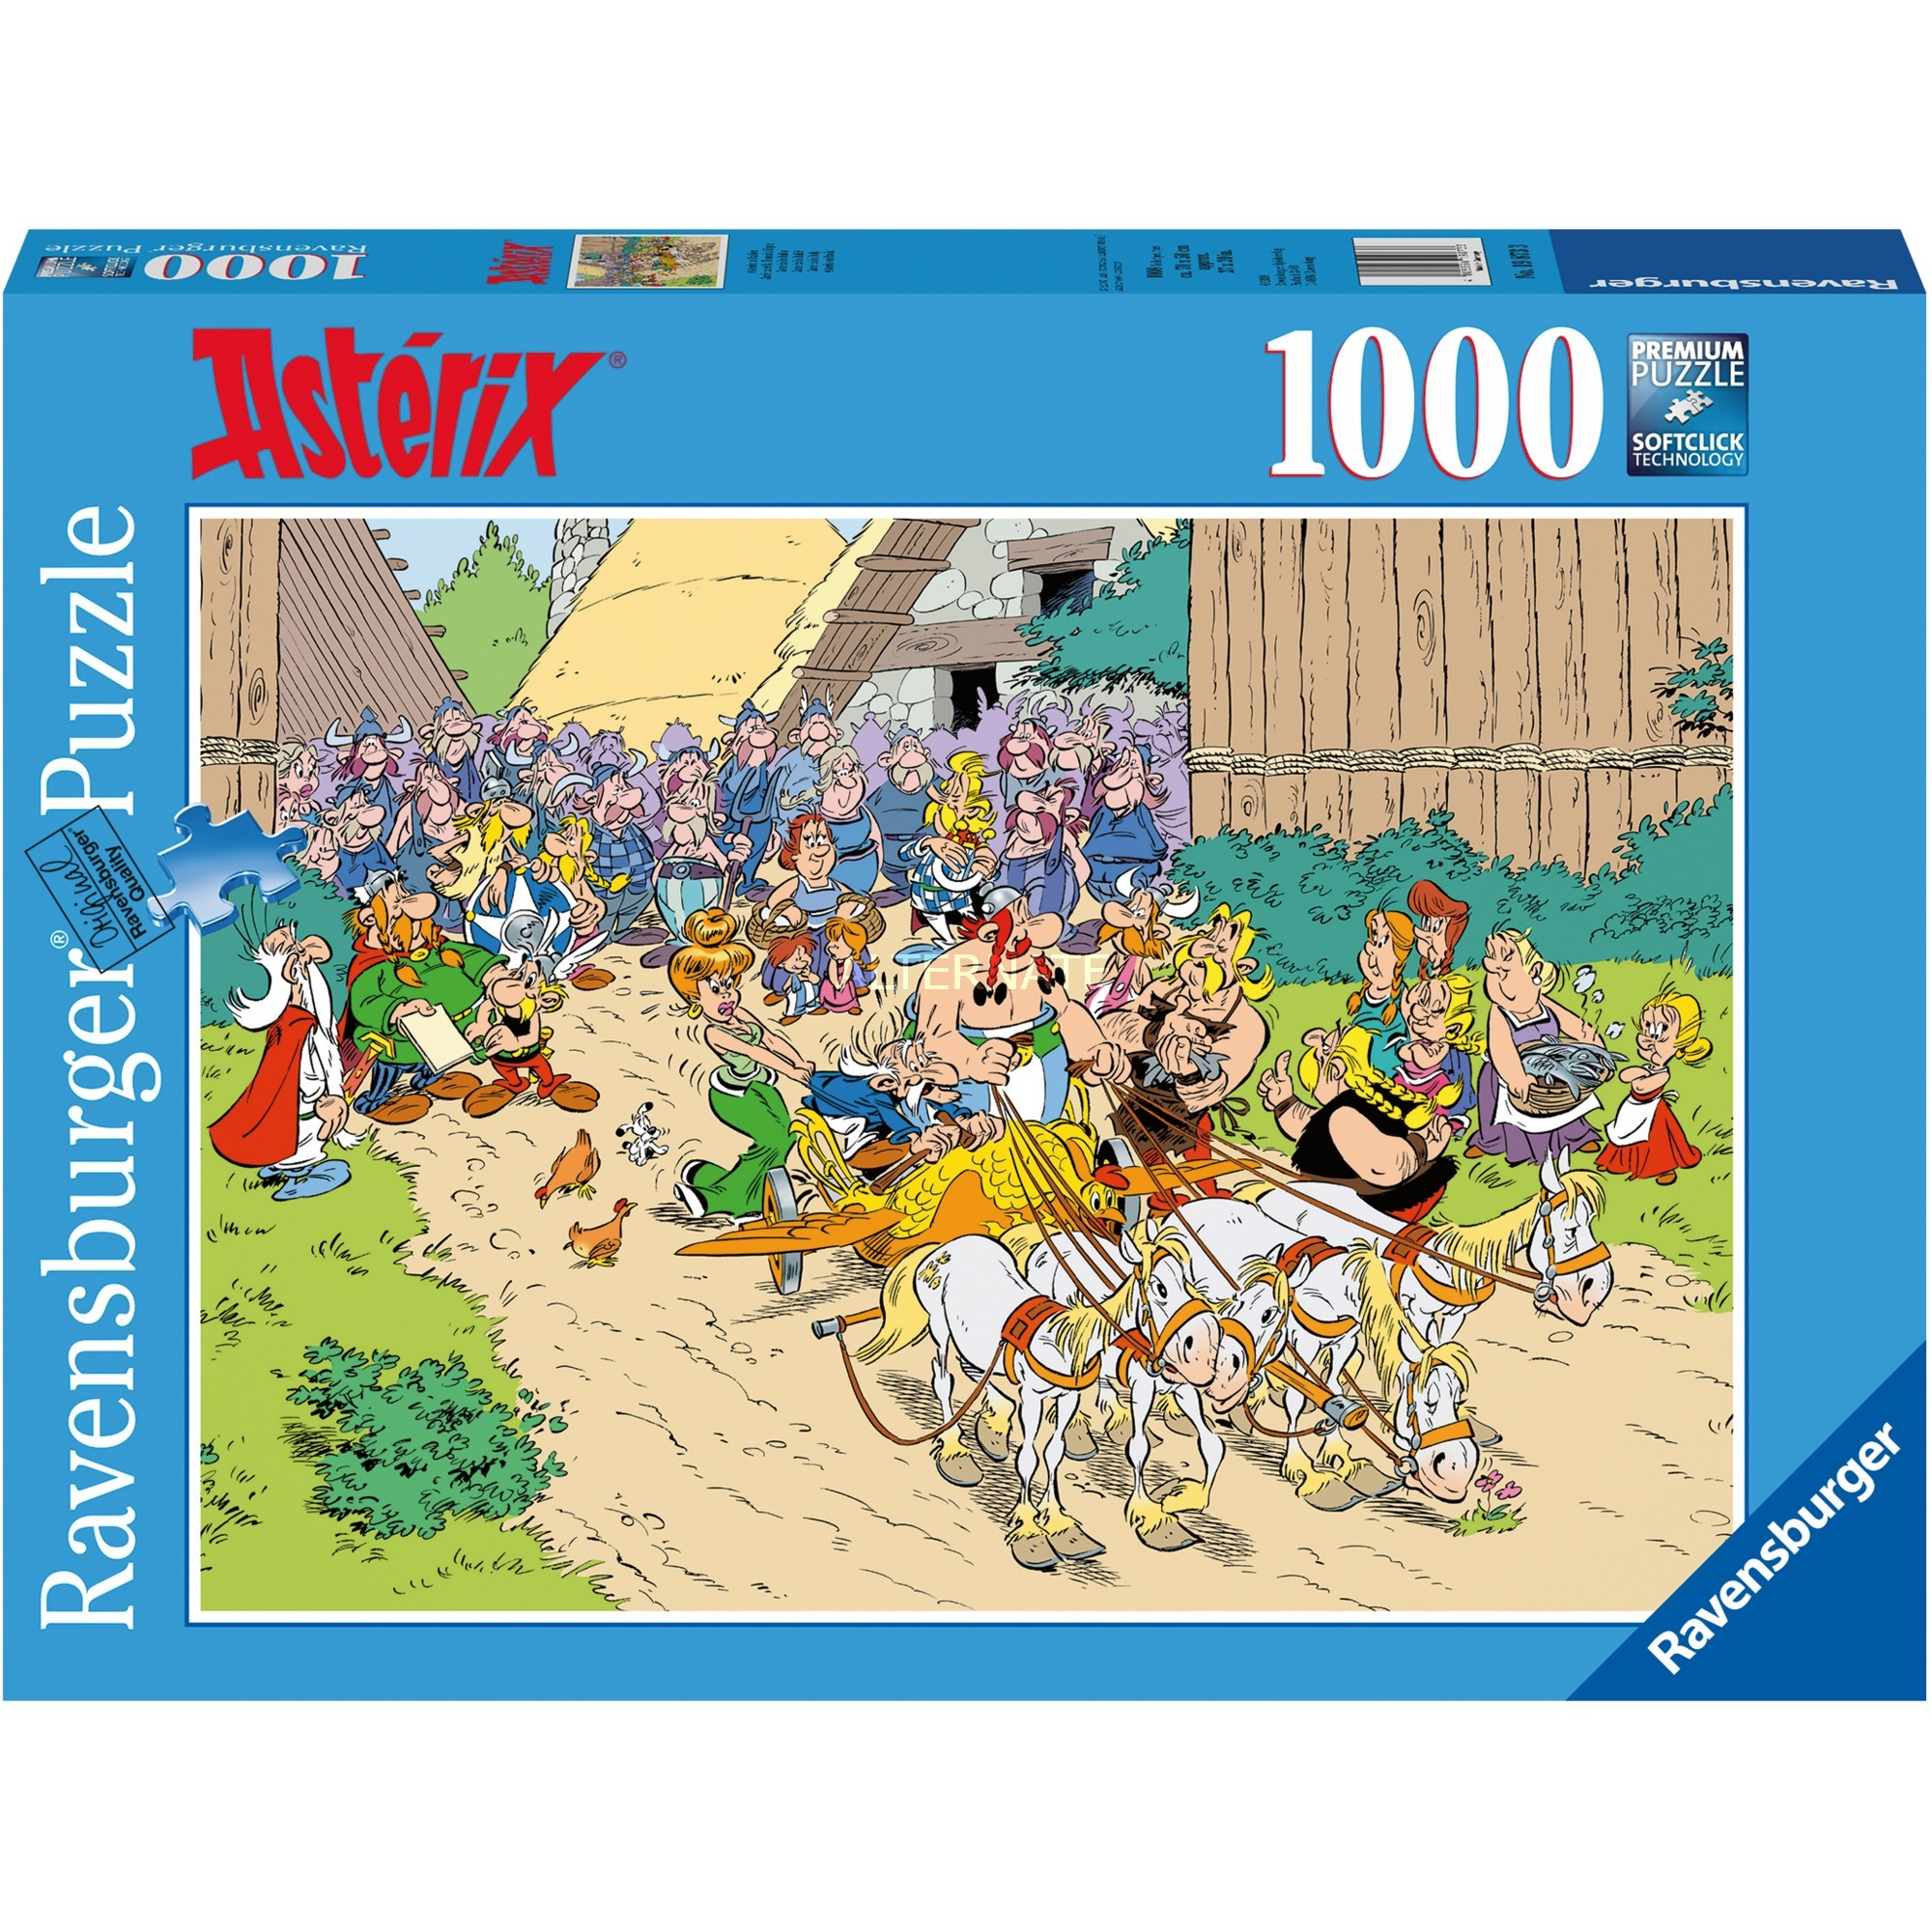 00.019.873 puzzle Puzzle rompecabezas 1000 pieza(s)